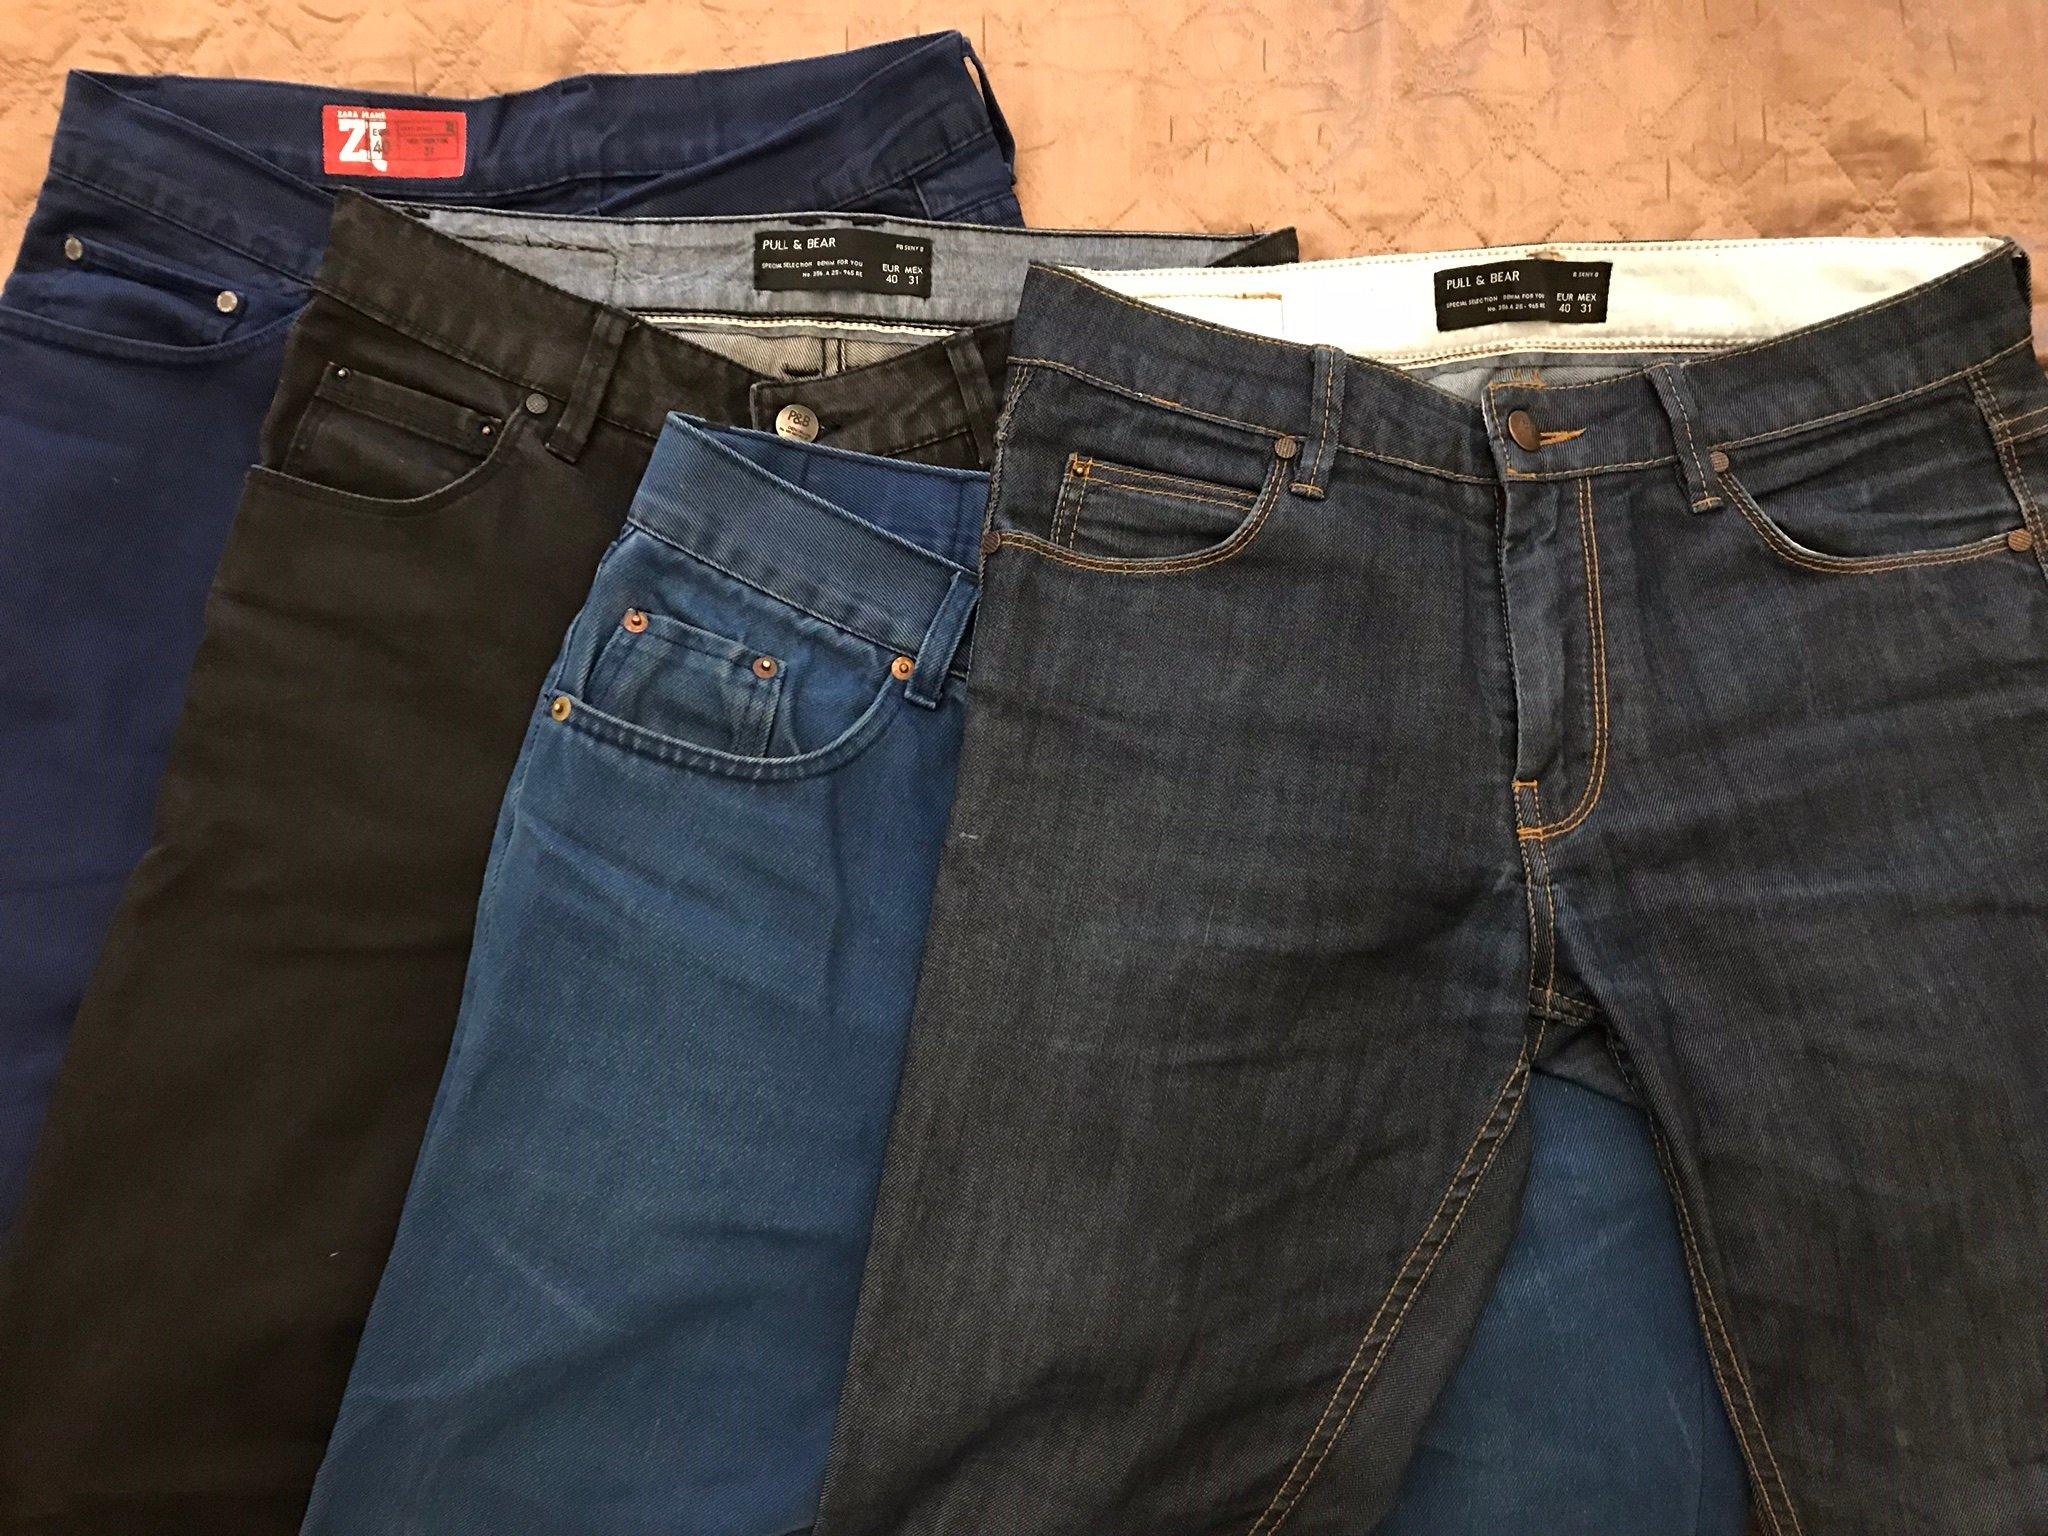 4 x jeansy + szorty + pasek Levi`s Vistula Zara